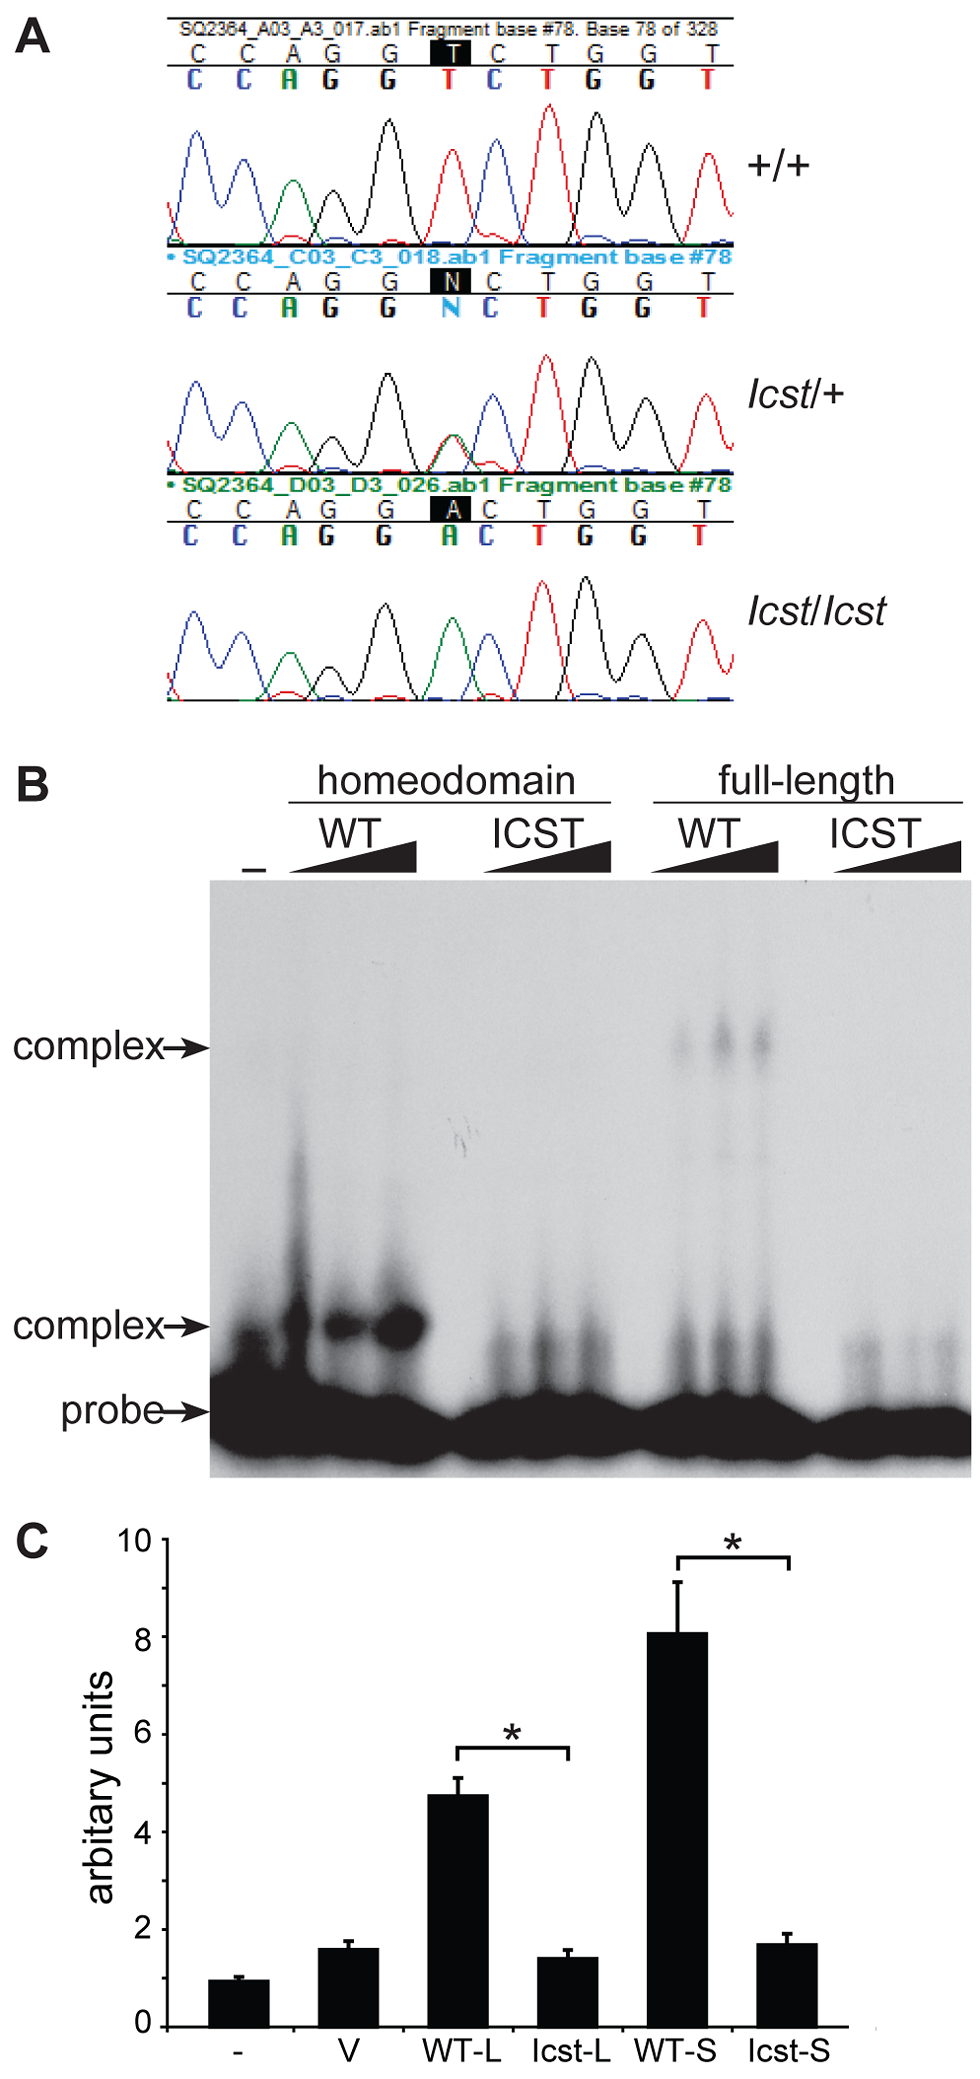 <i>Icst</i> is a homeodomain missense mutation of <i>Lmx1b</i> that abolishes protein function.